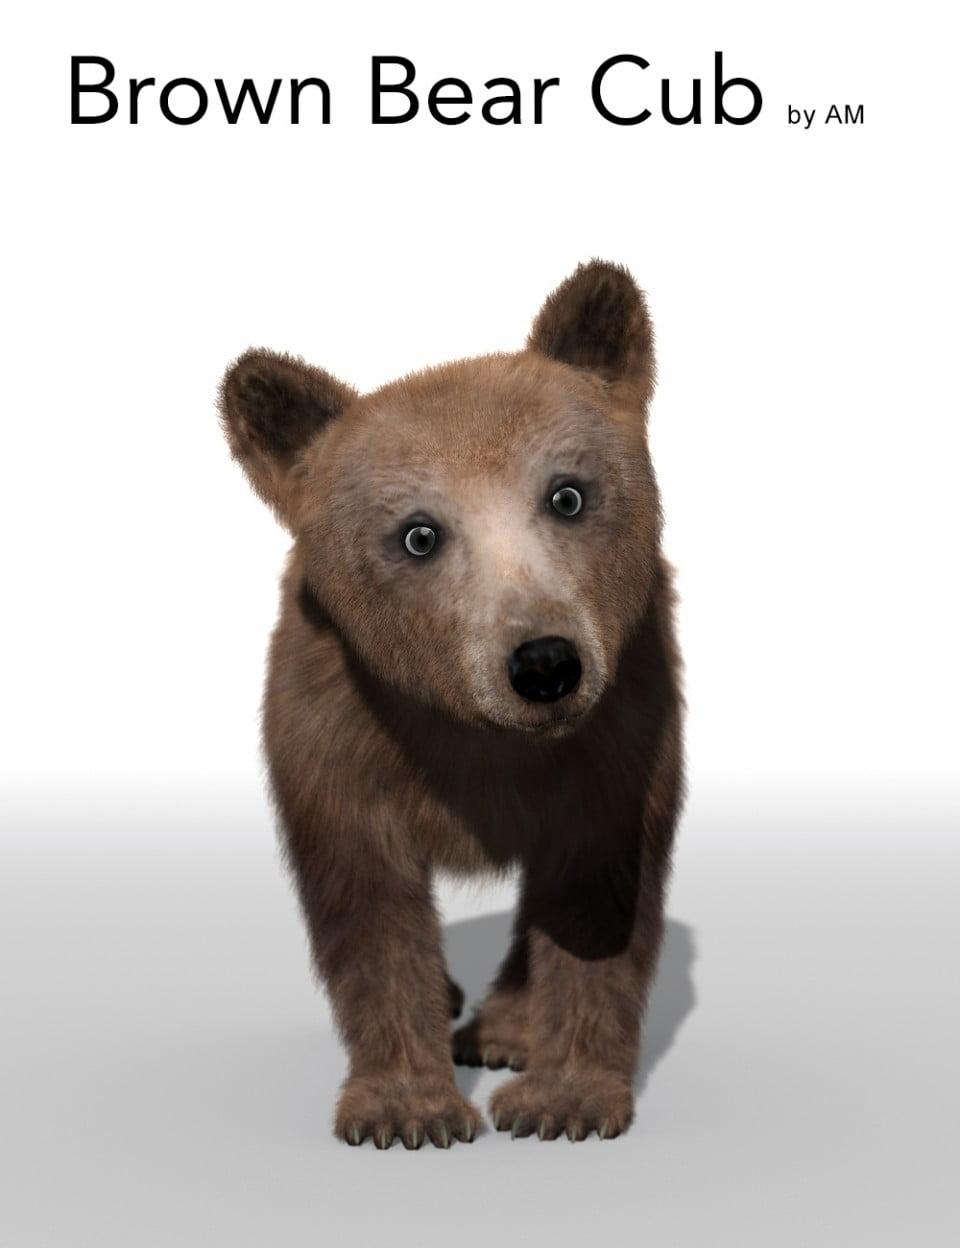 AM Brown Bear Cub